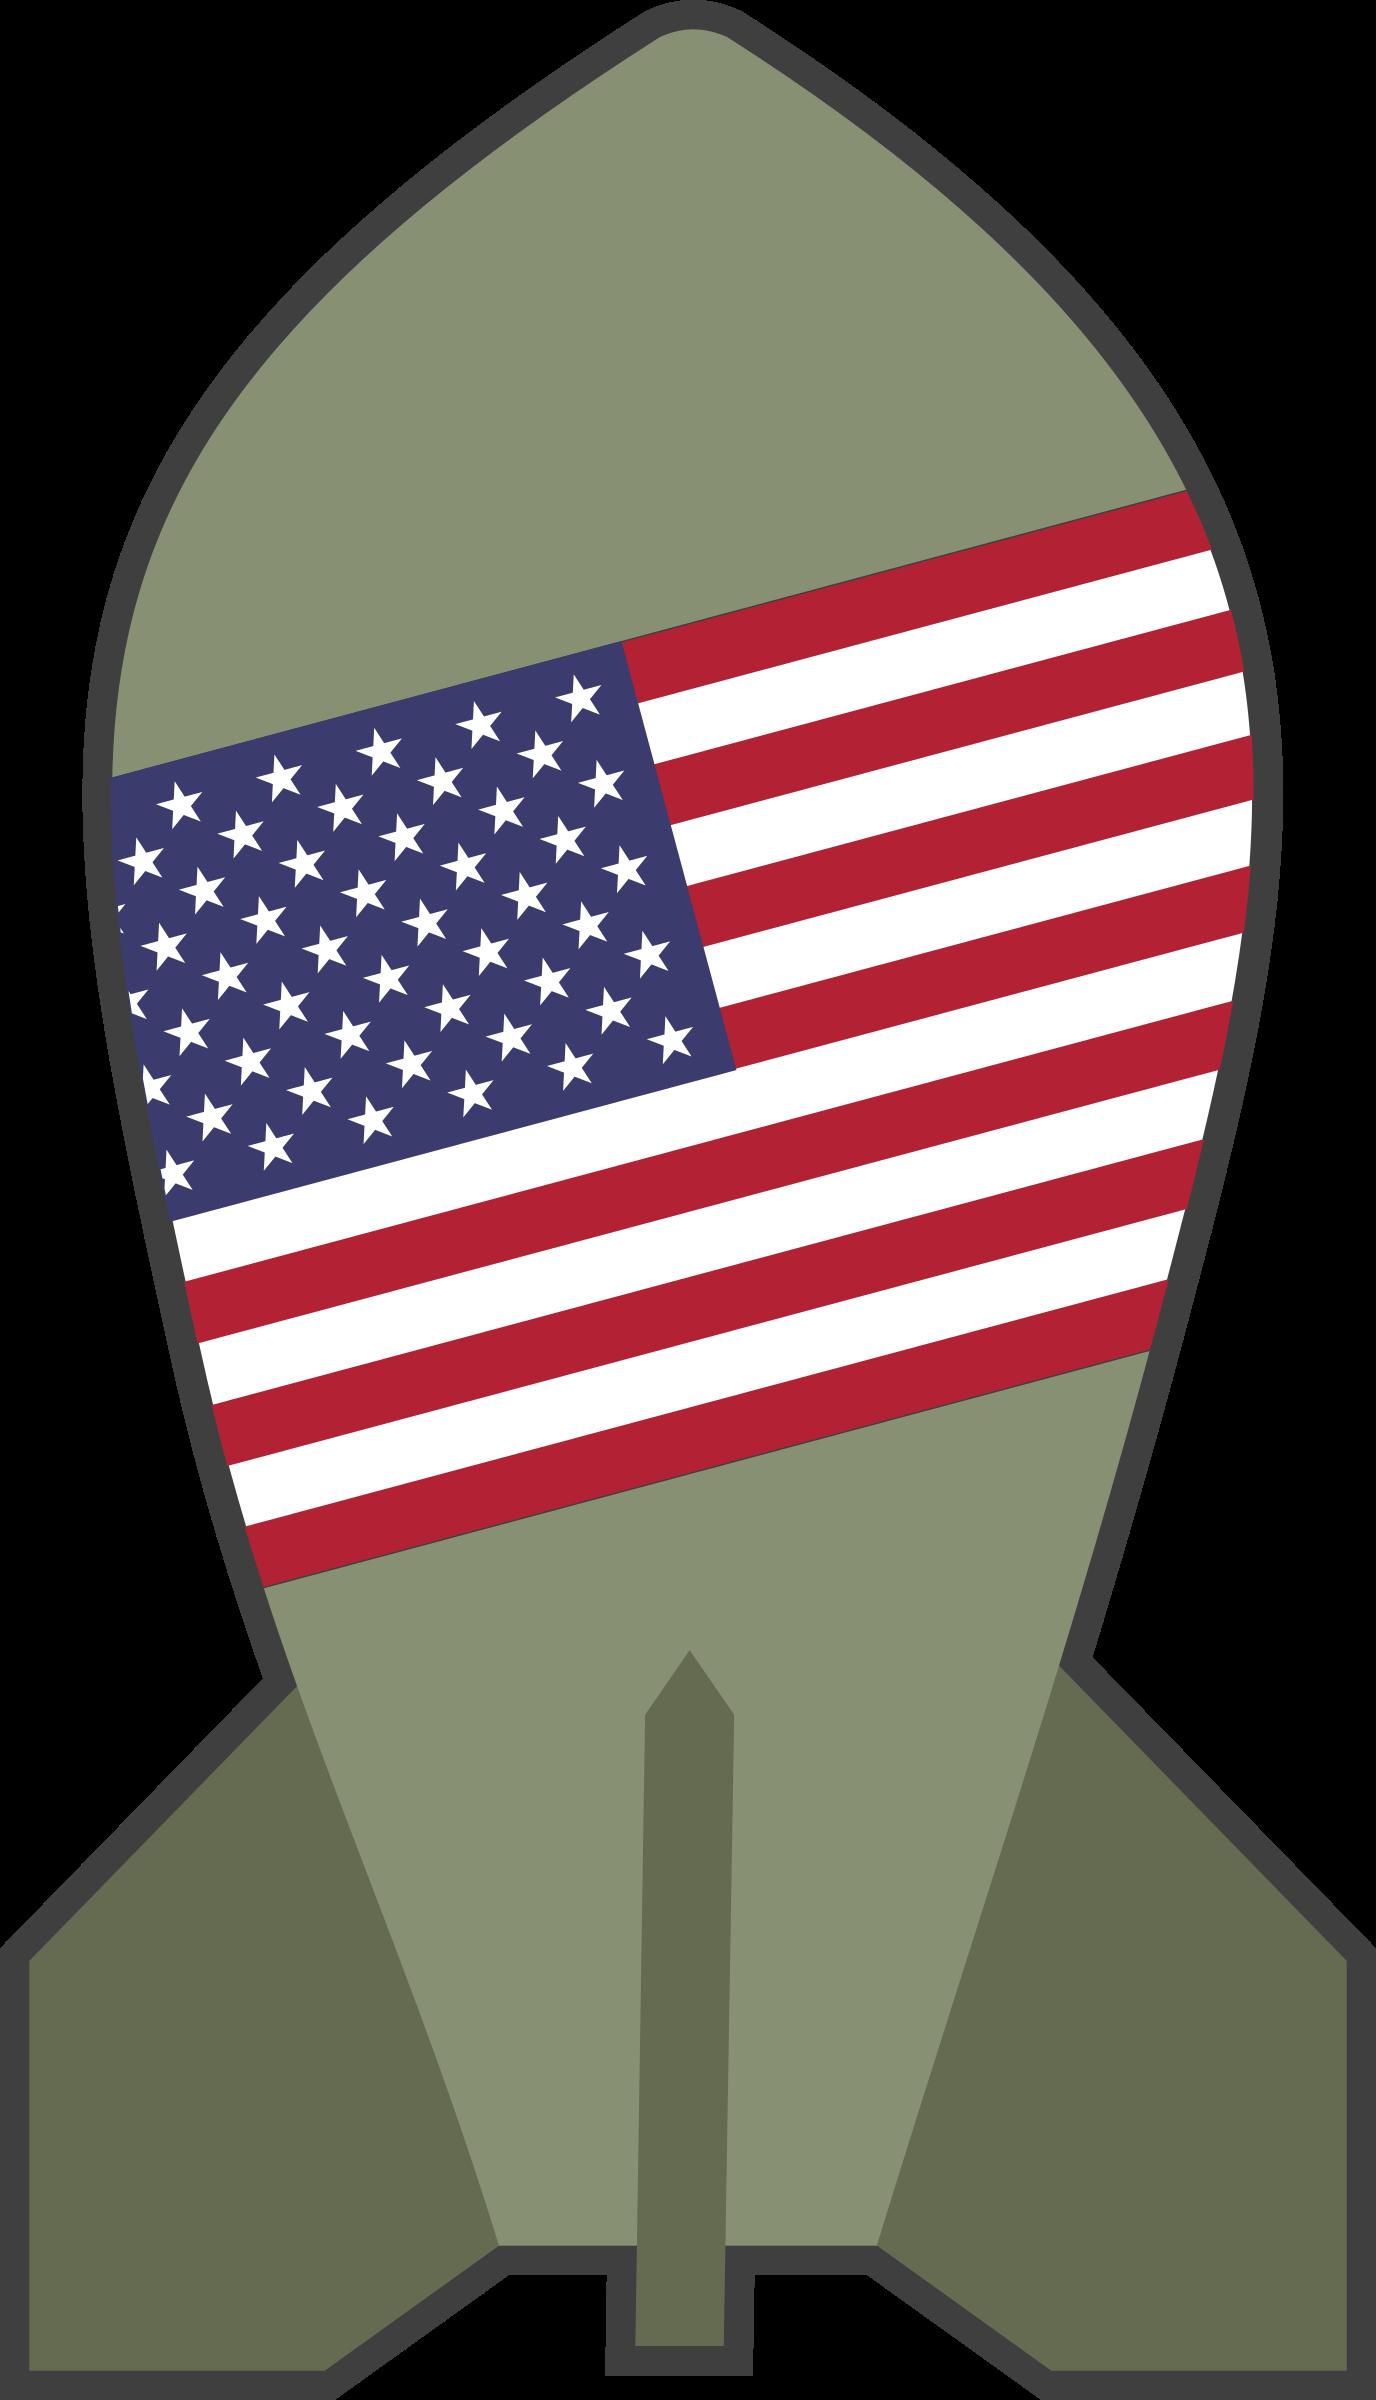 Clipart us banner transparent Clipart - U.S. American Bomb banner transparent